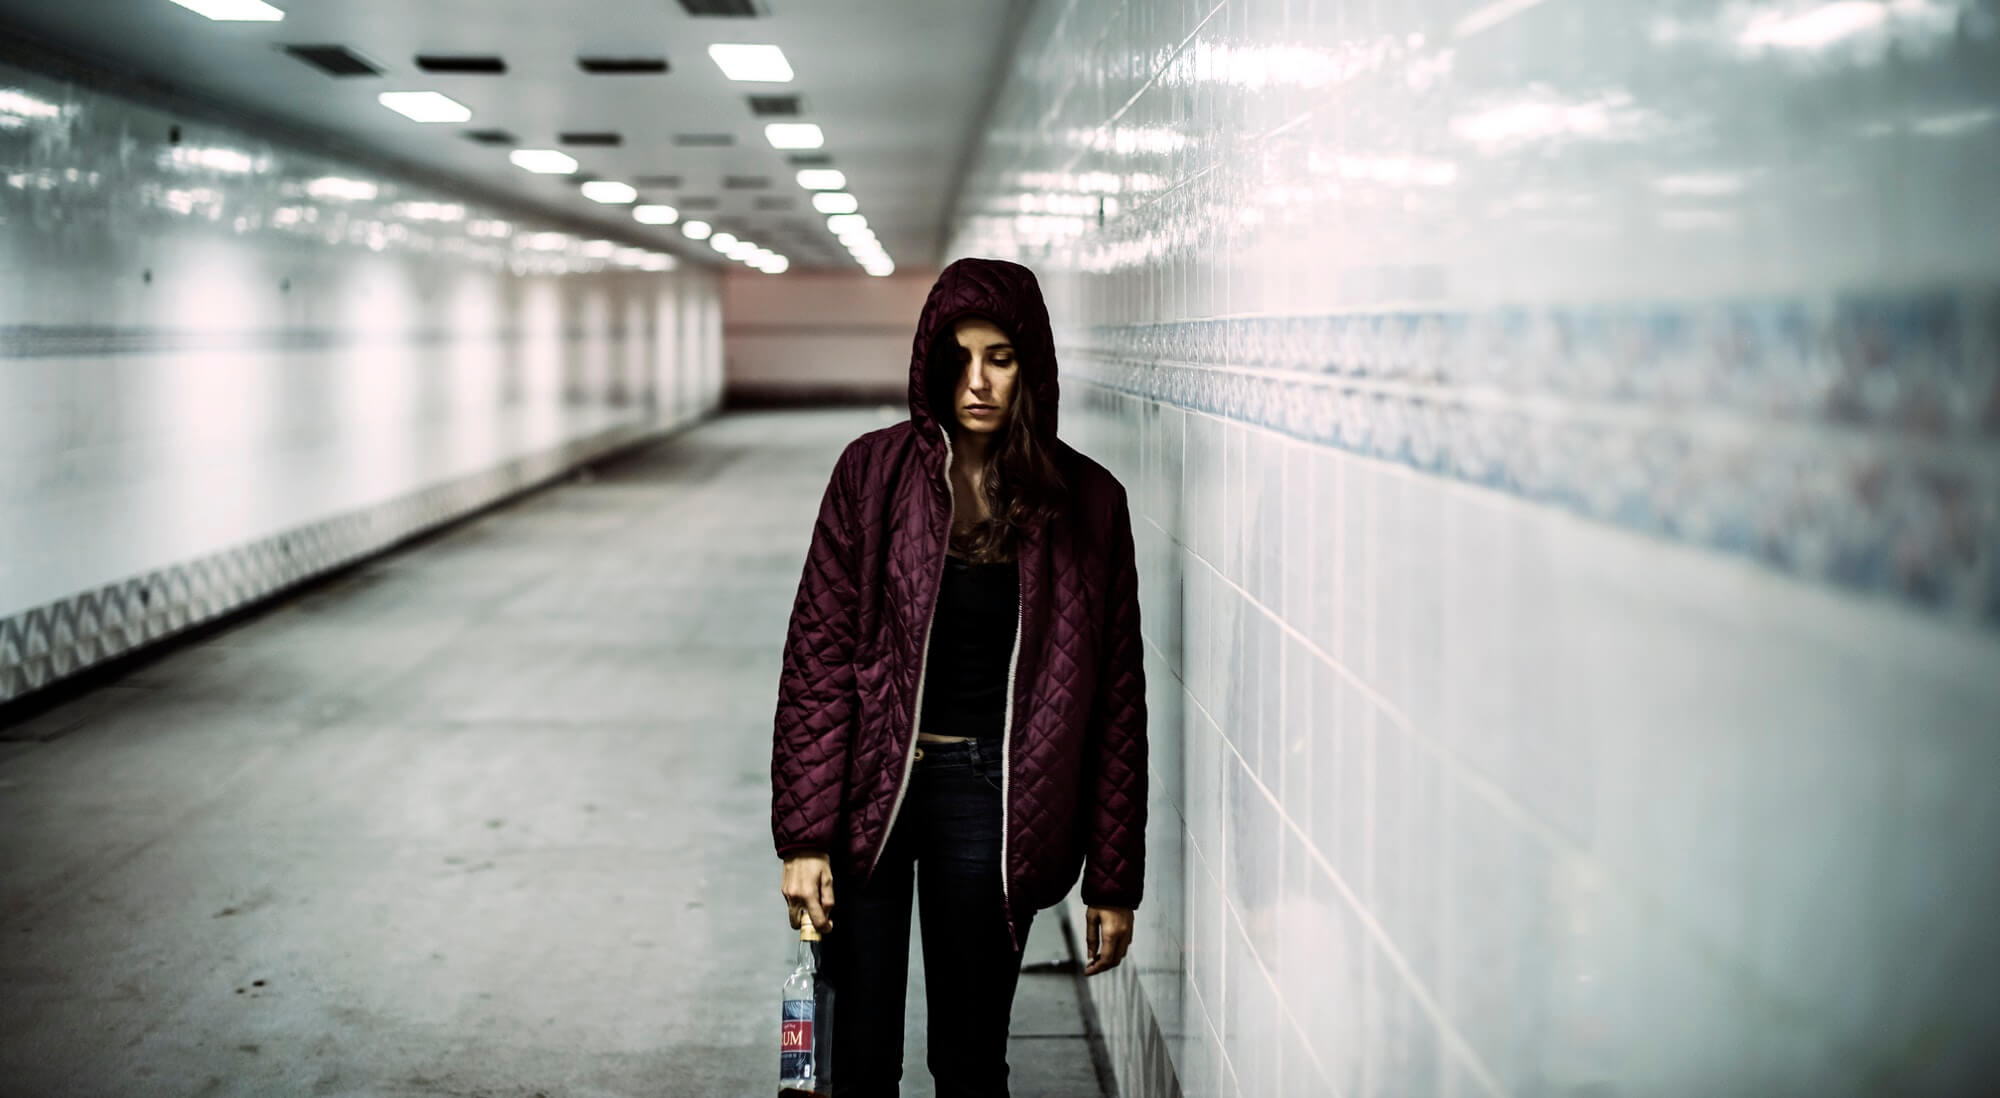 Homeless Alcoholism Woman Holding Liquor Bottle